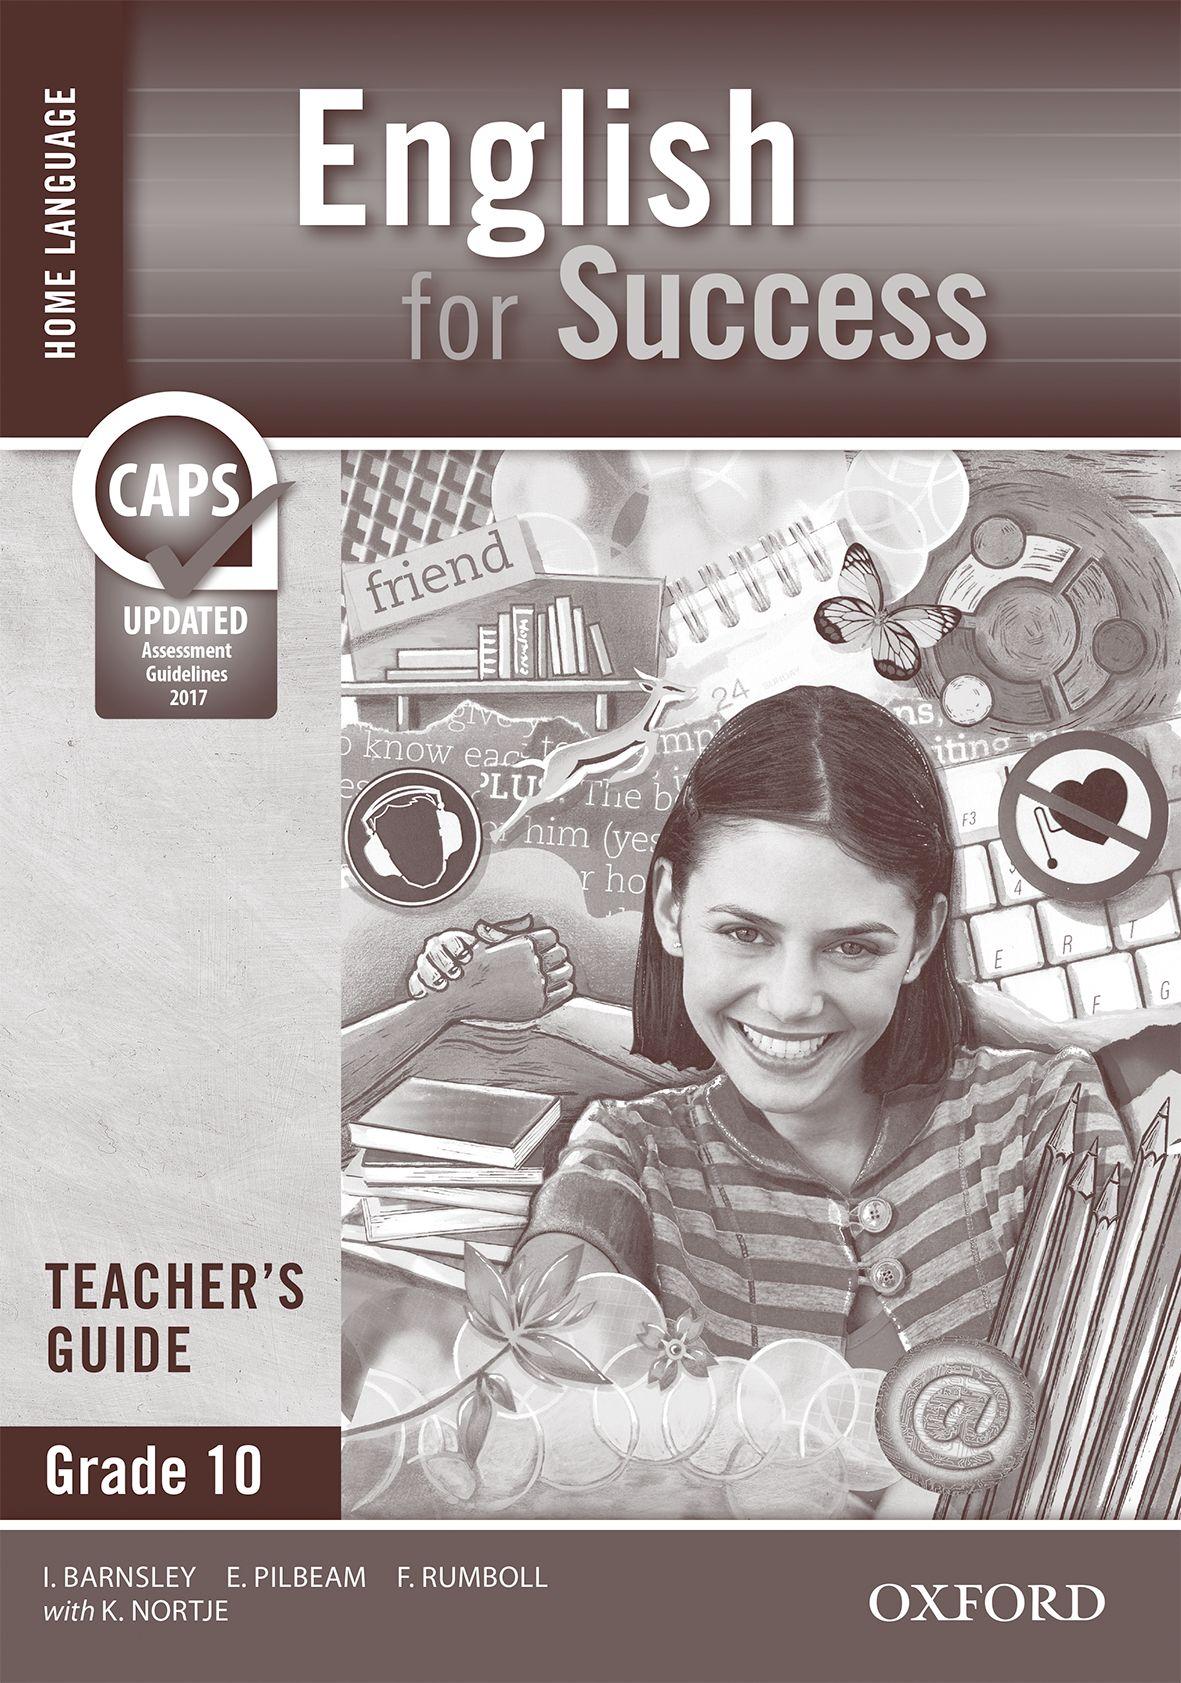 Oxford University Press English For Success Grade 10